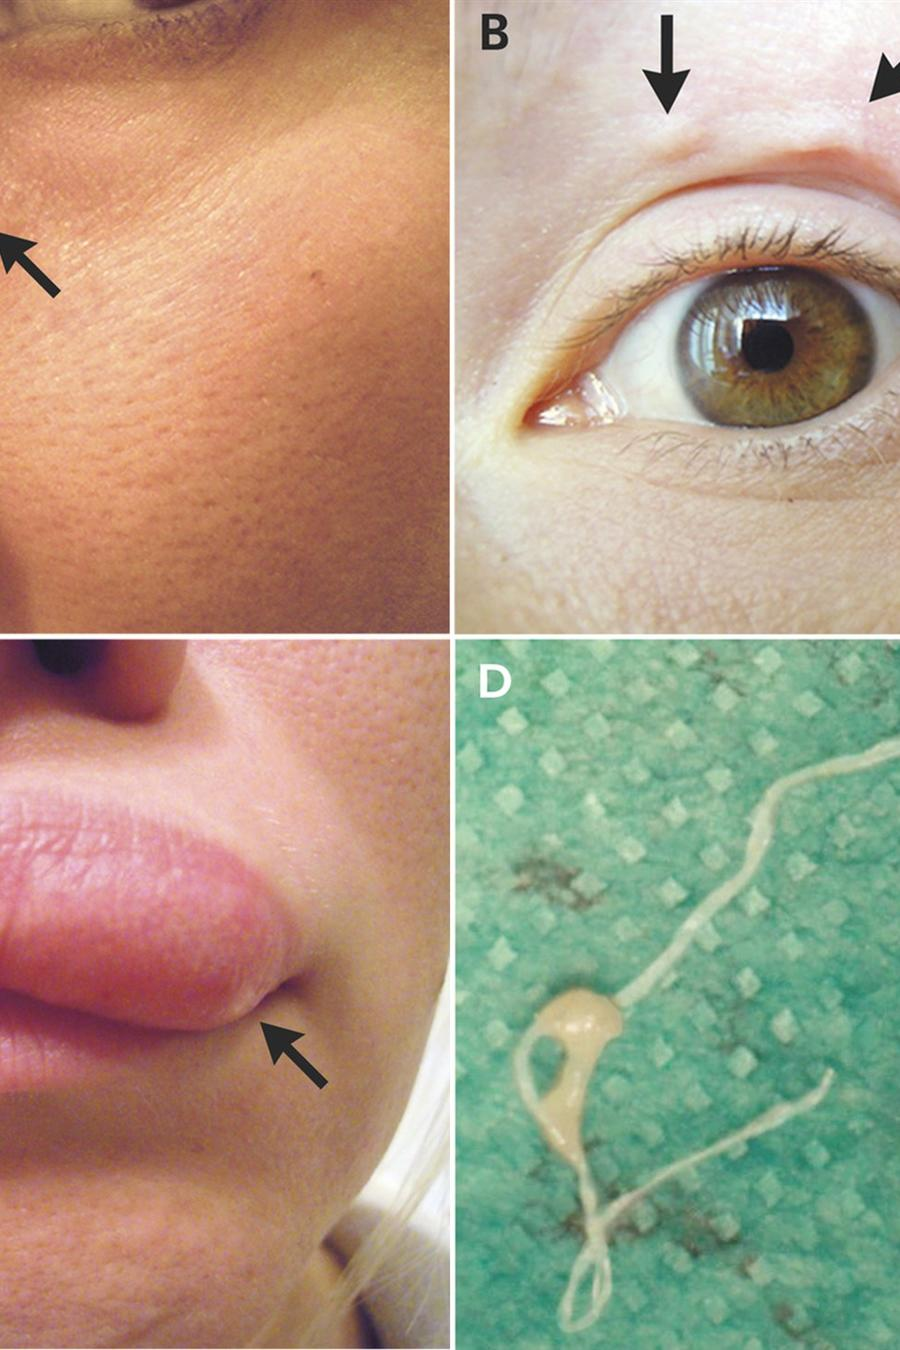 Dirofilaria repens